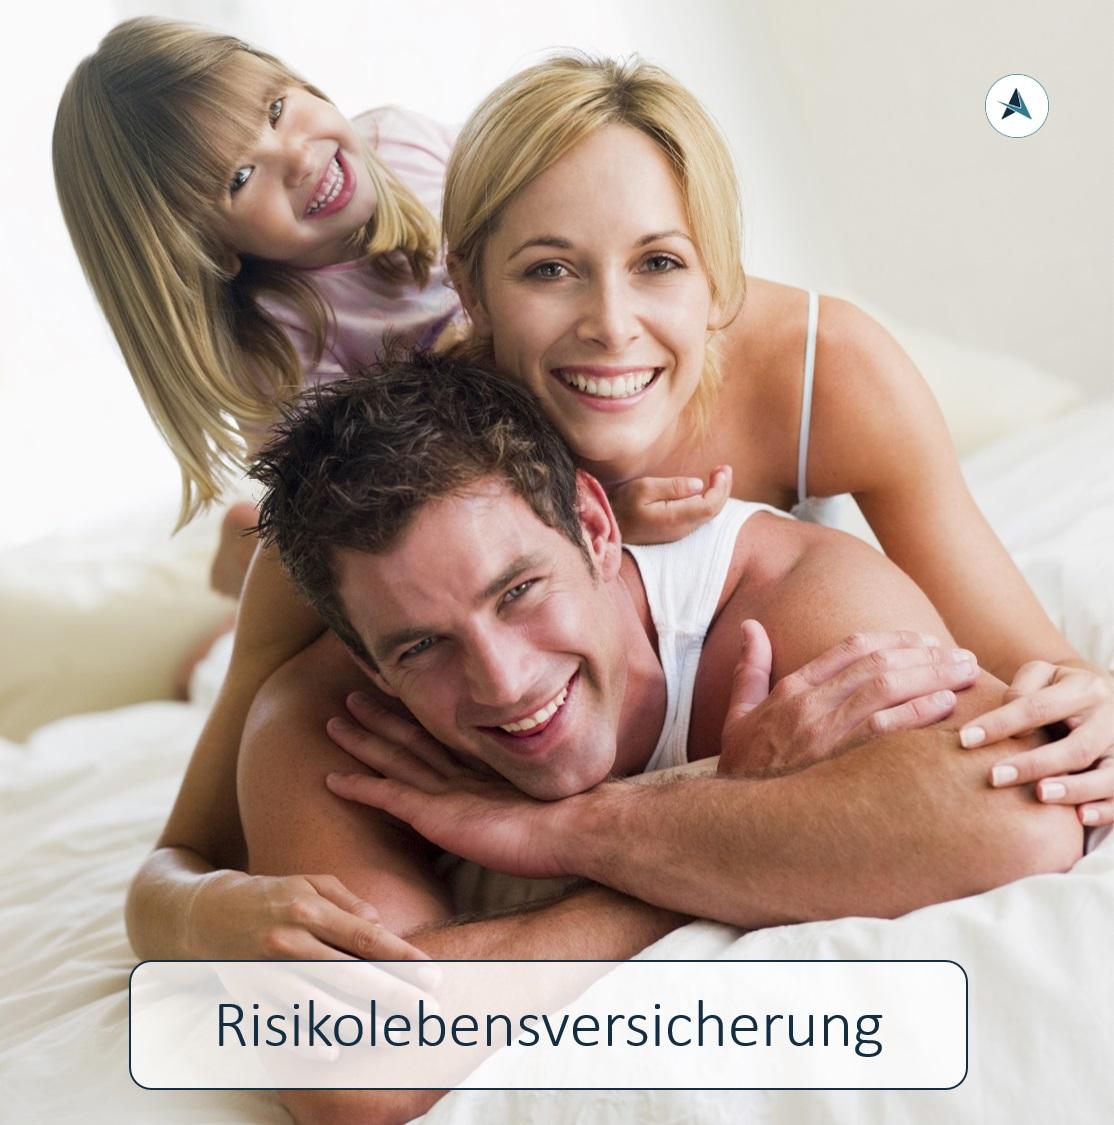 Kaulsdorf-Versicherungsmakler-Berlin-Risikolebensversicherung-Lebensversicherung-André-Böttcher-Risiko-Leben